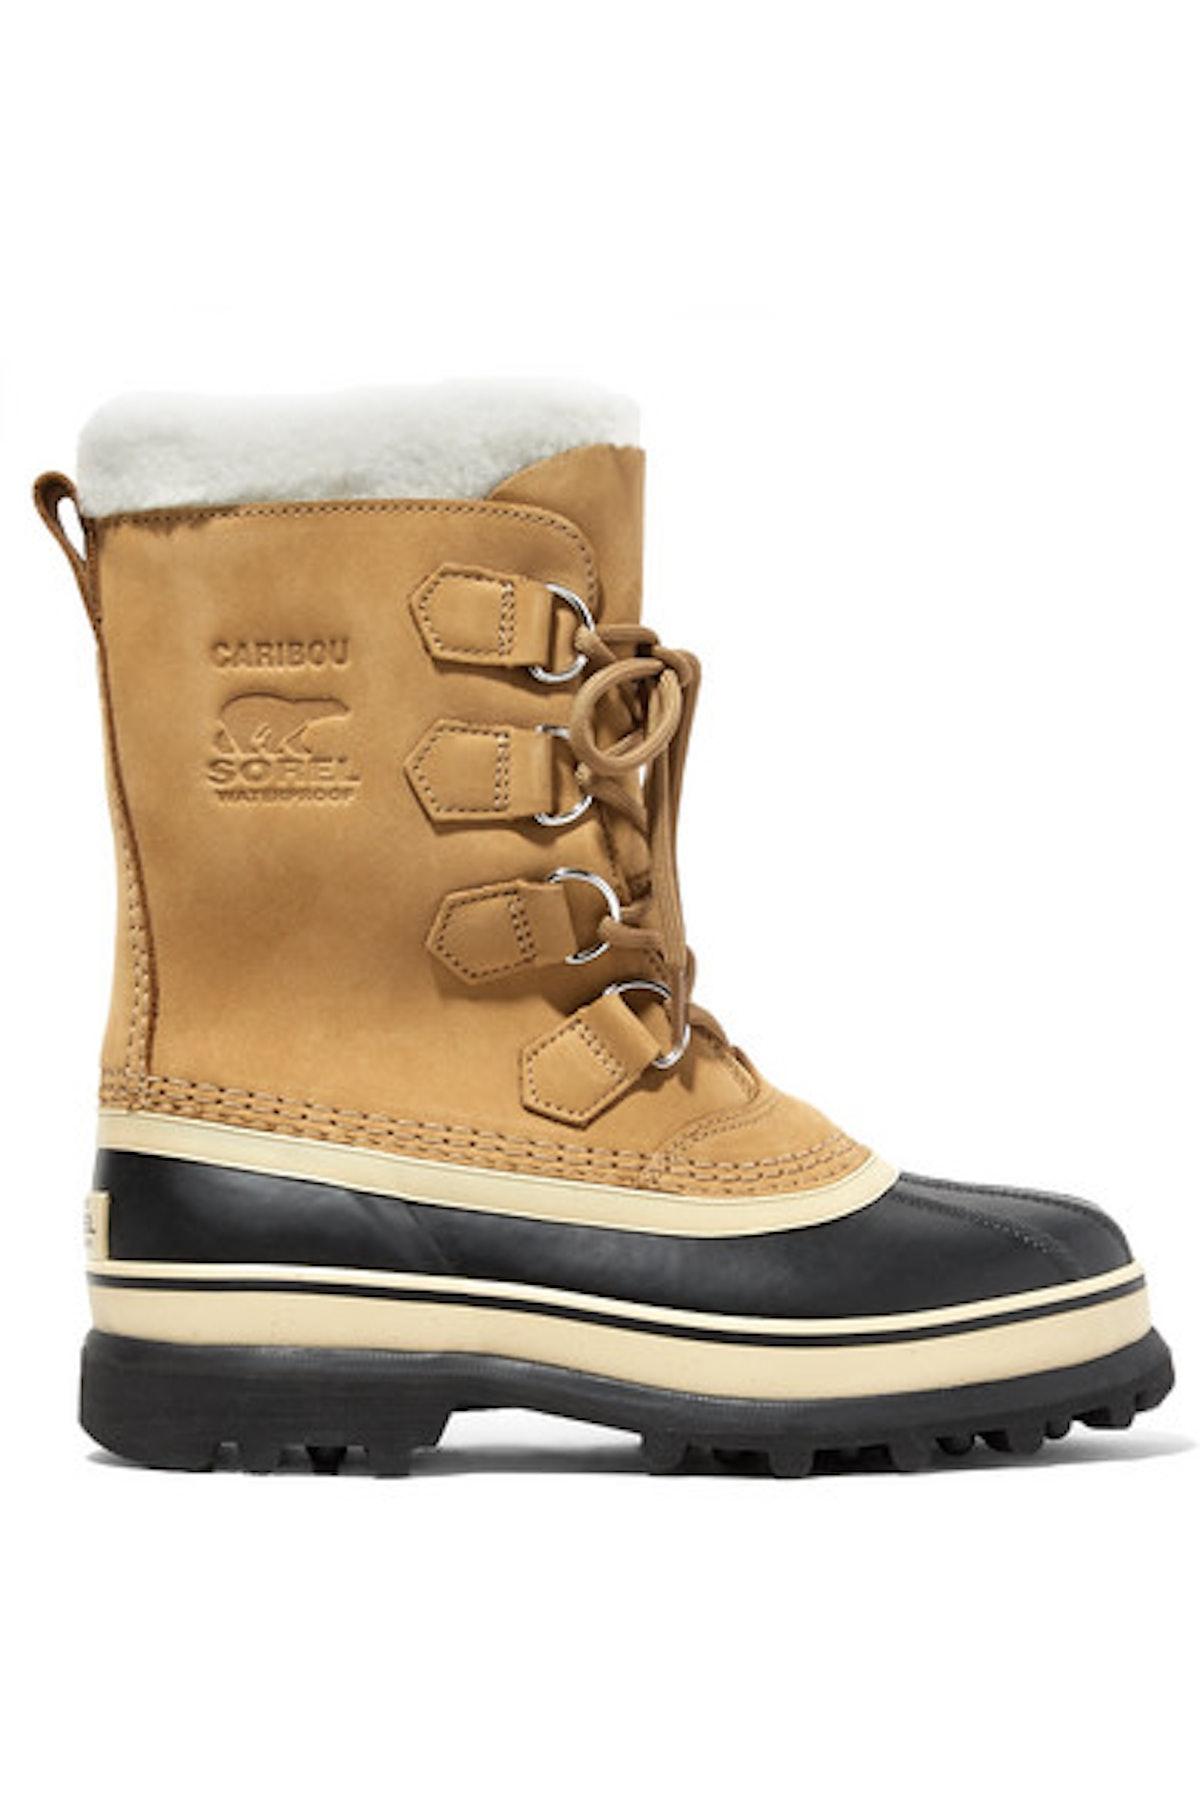 SOREL Caribou fleece-trimmed nubuck and rubber snow boots